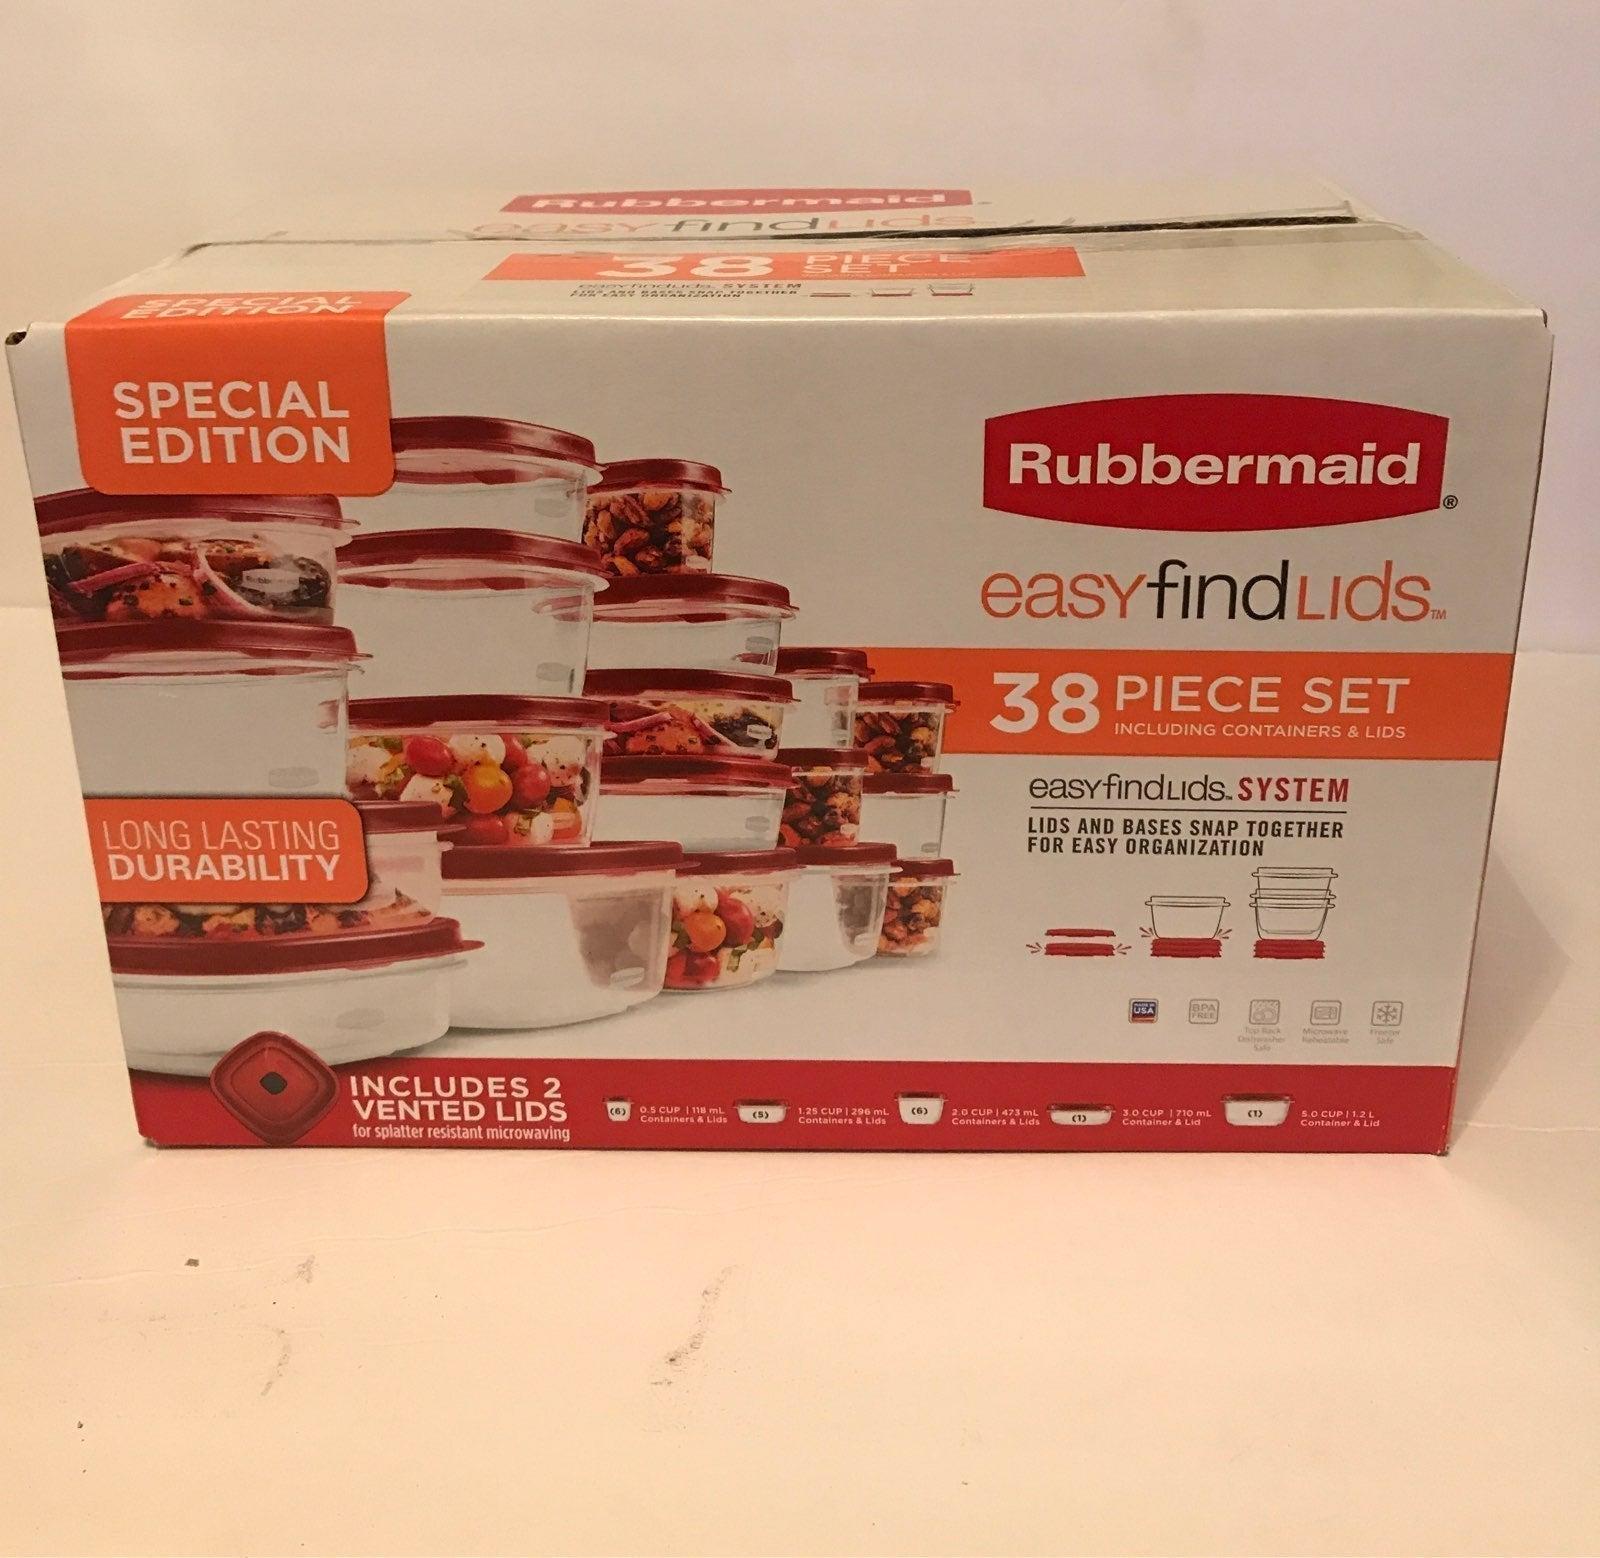 Rubbermaid special edition 38 piece set